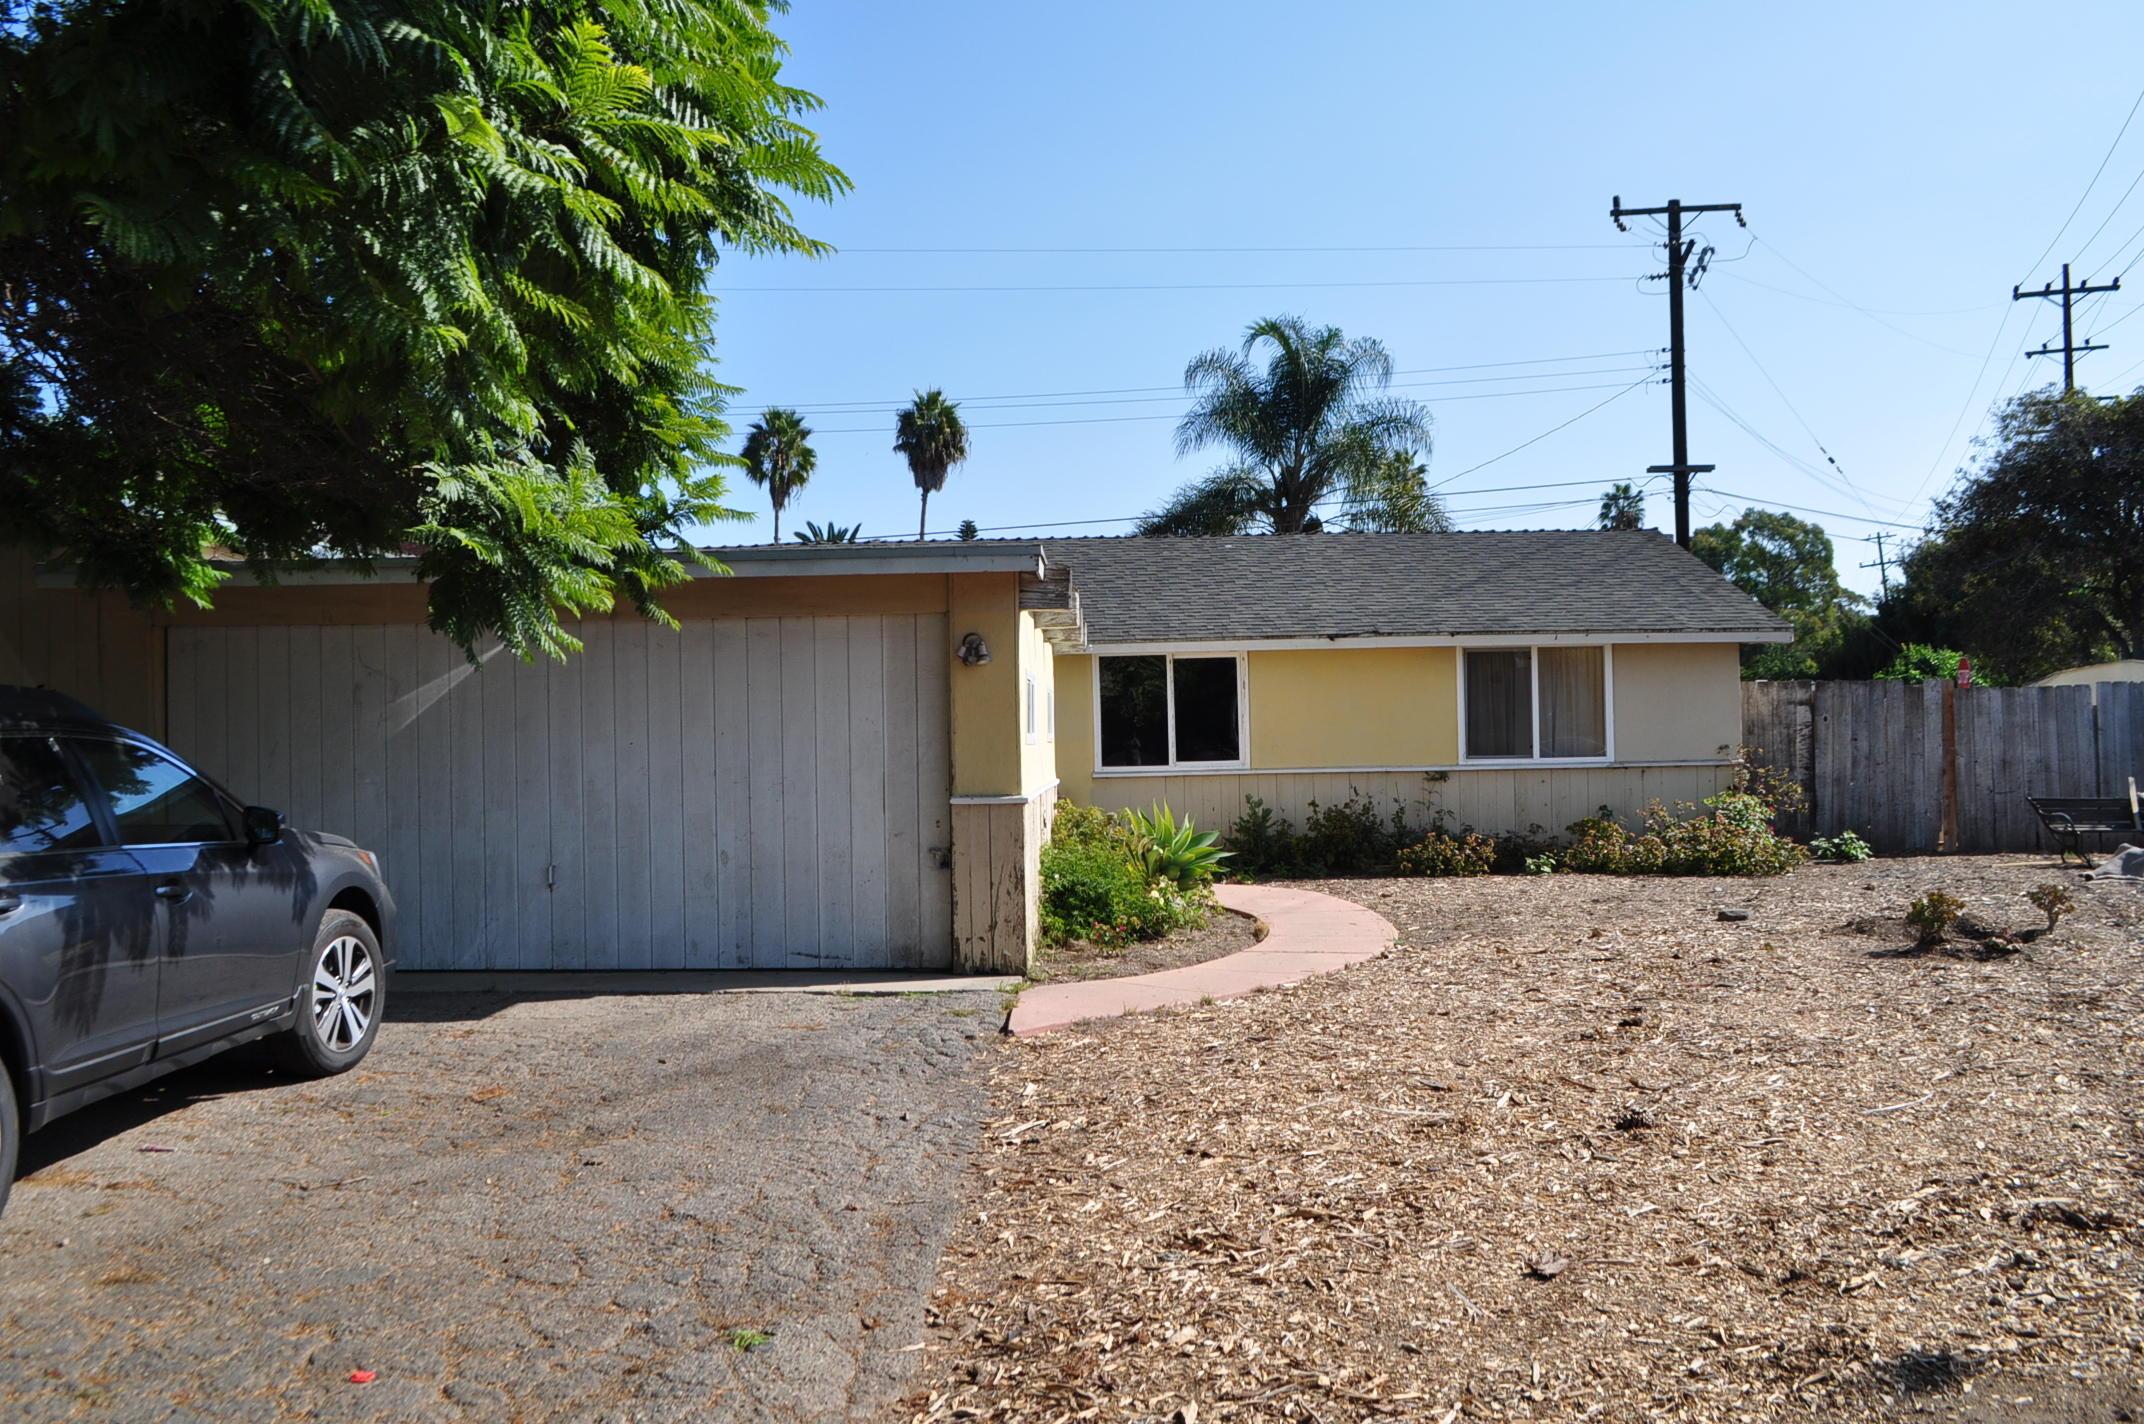 Property photo for 515 Peach Grove Ln Santa Barbara, California 93105 - 18-4090